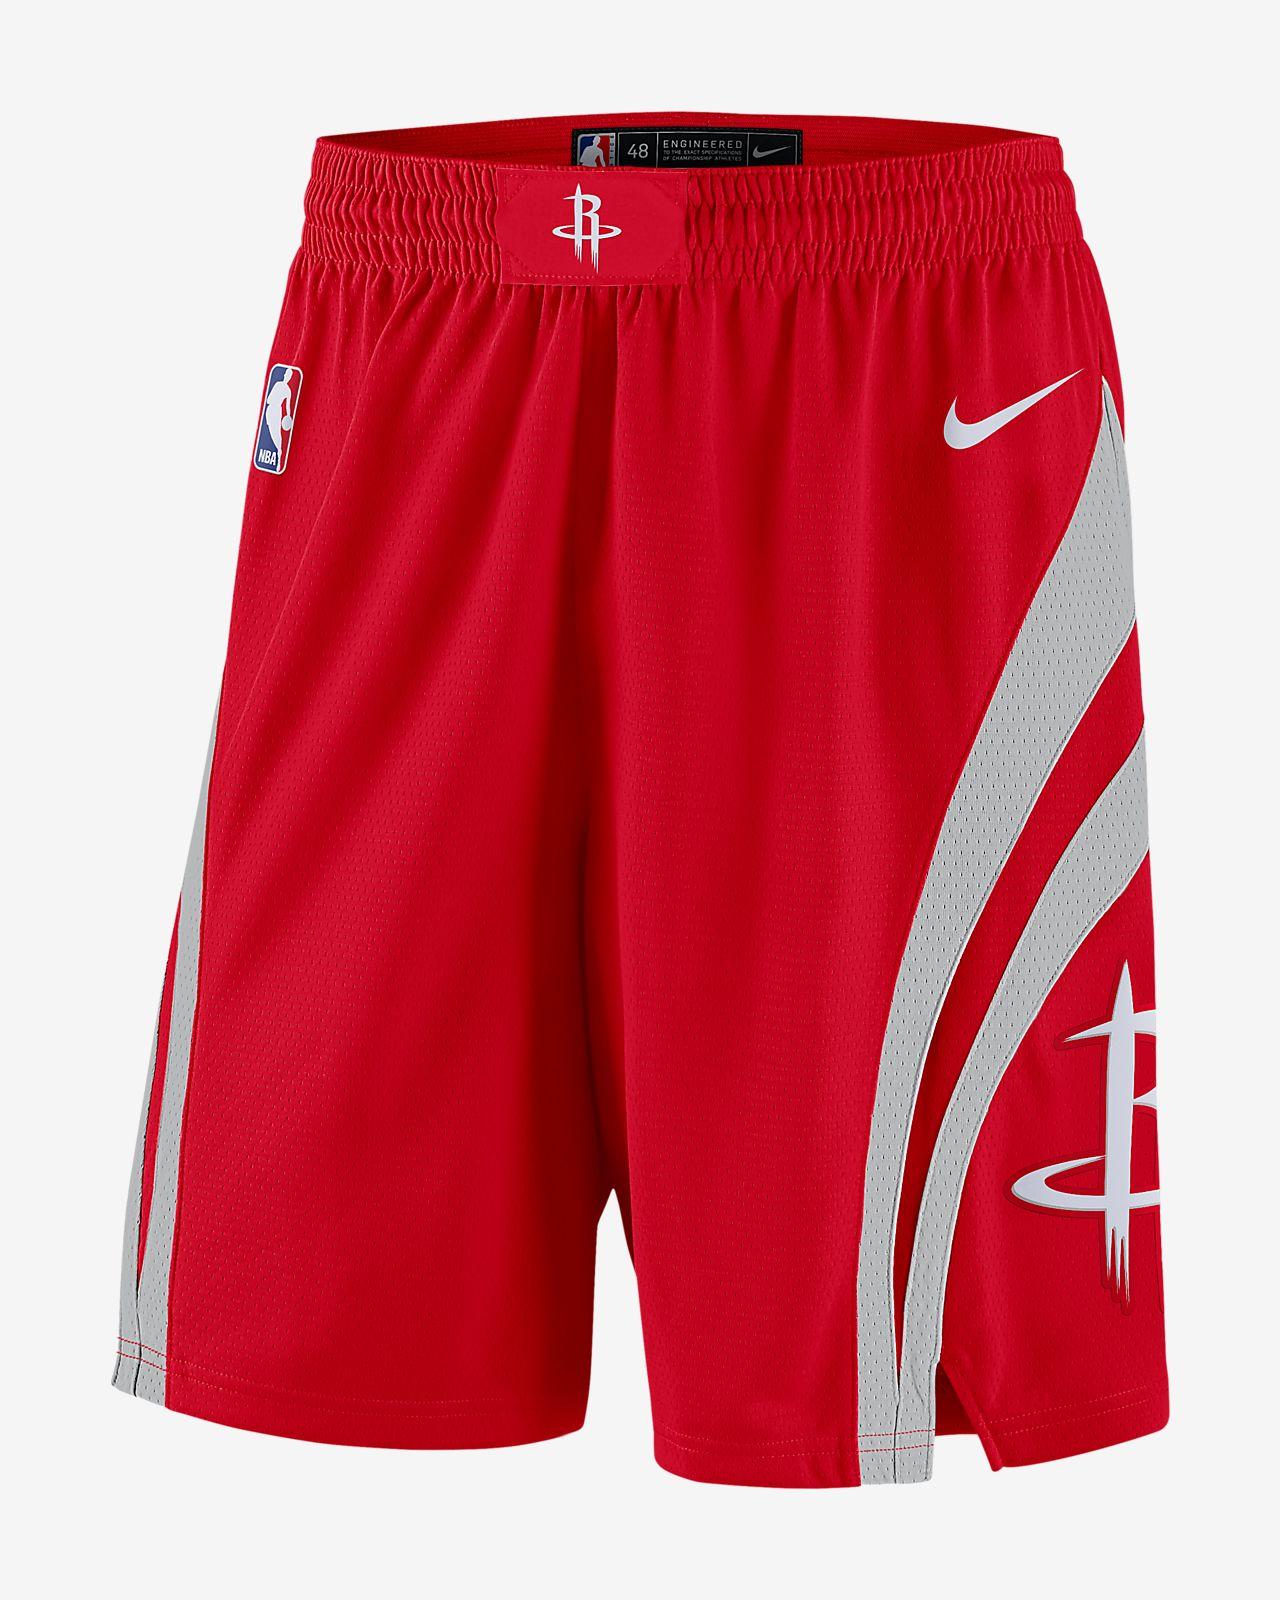 innovative design 2f2ea 58992 Houston Rockets Icon Edition Swingman Men's Nike NBA Shorts